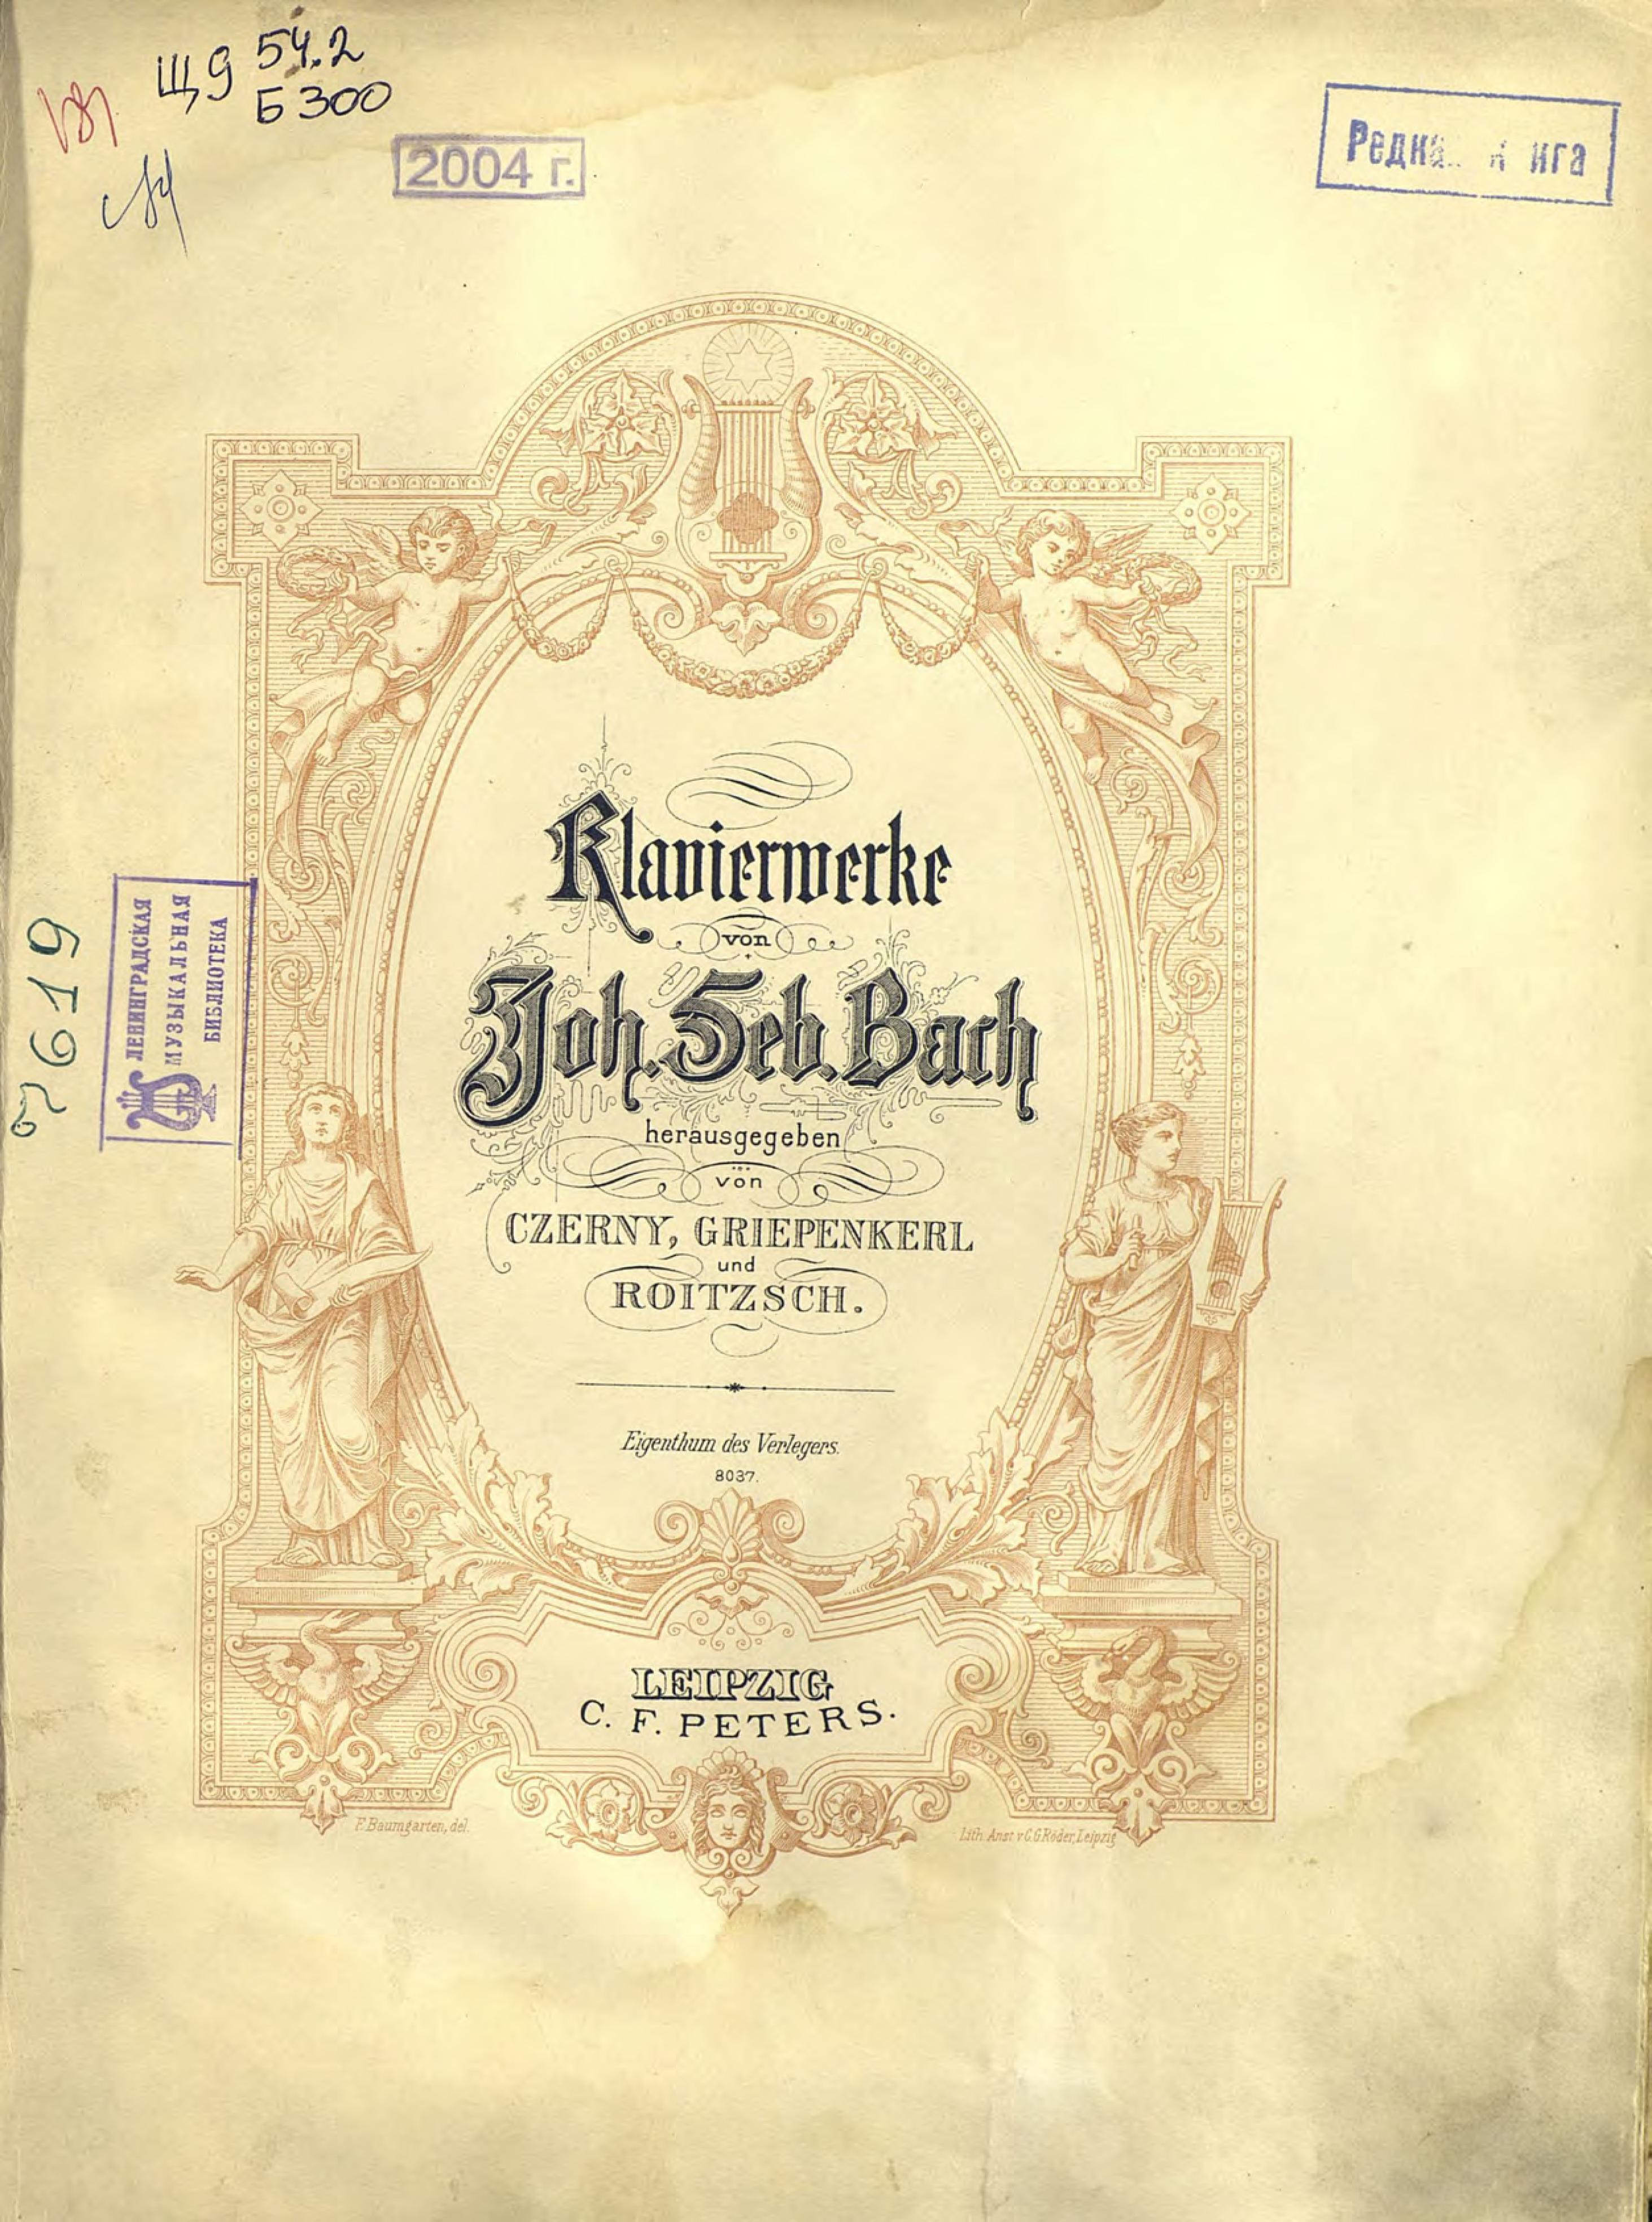 Иоганн Себастьян Бах Klavierwerke v. J. S. Bach и с бах и с бах маленькие прелюдии и фугетты для фортепиано j s bach little preludes and fughettas for piano isbn 979 0 66006 014 8